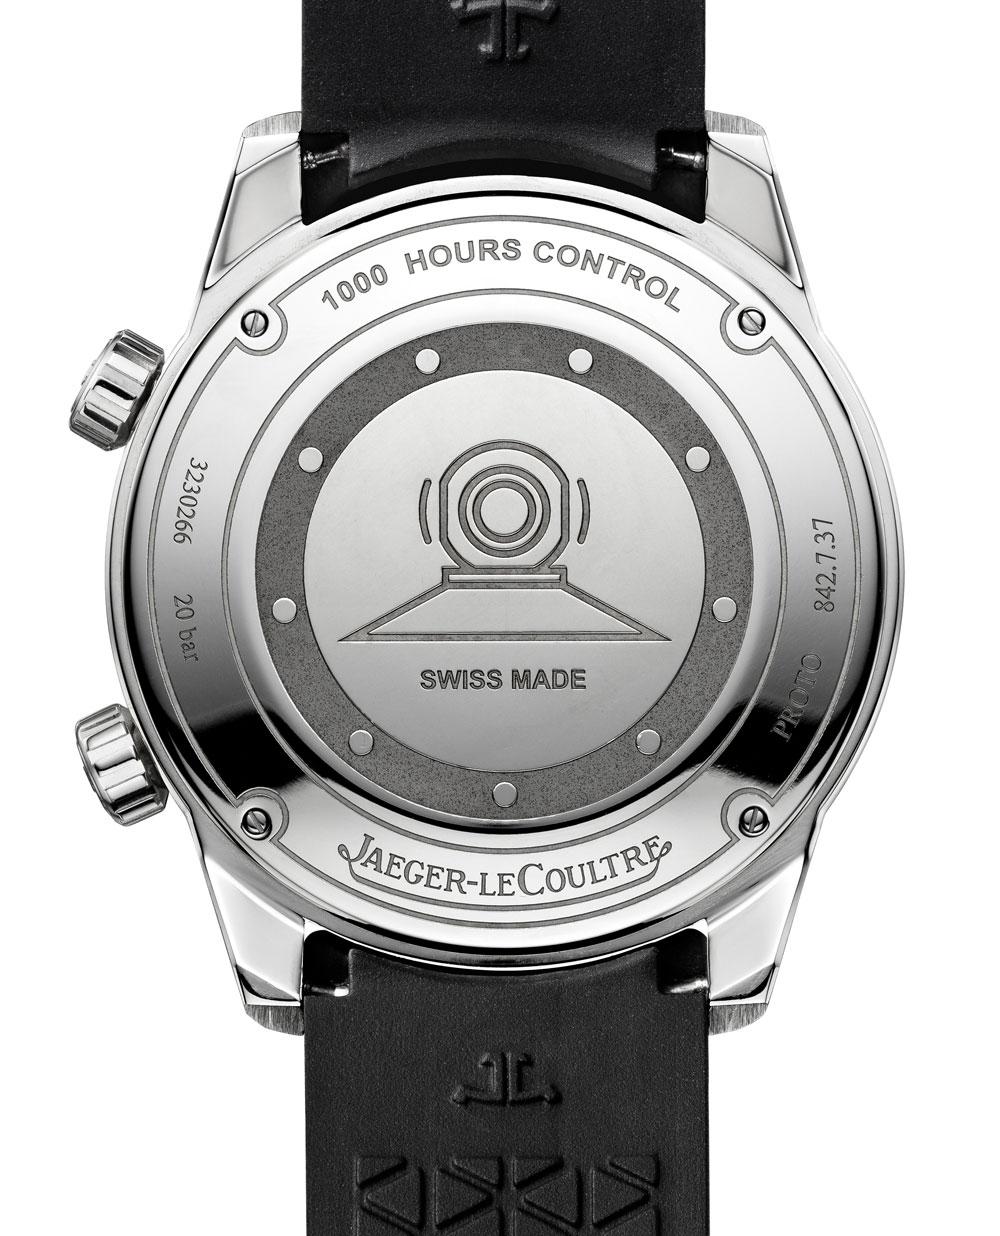 Fondo reloj Polaris Date de Jaeger-LeCoultre grabado con escafandra